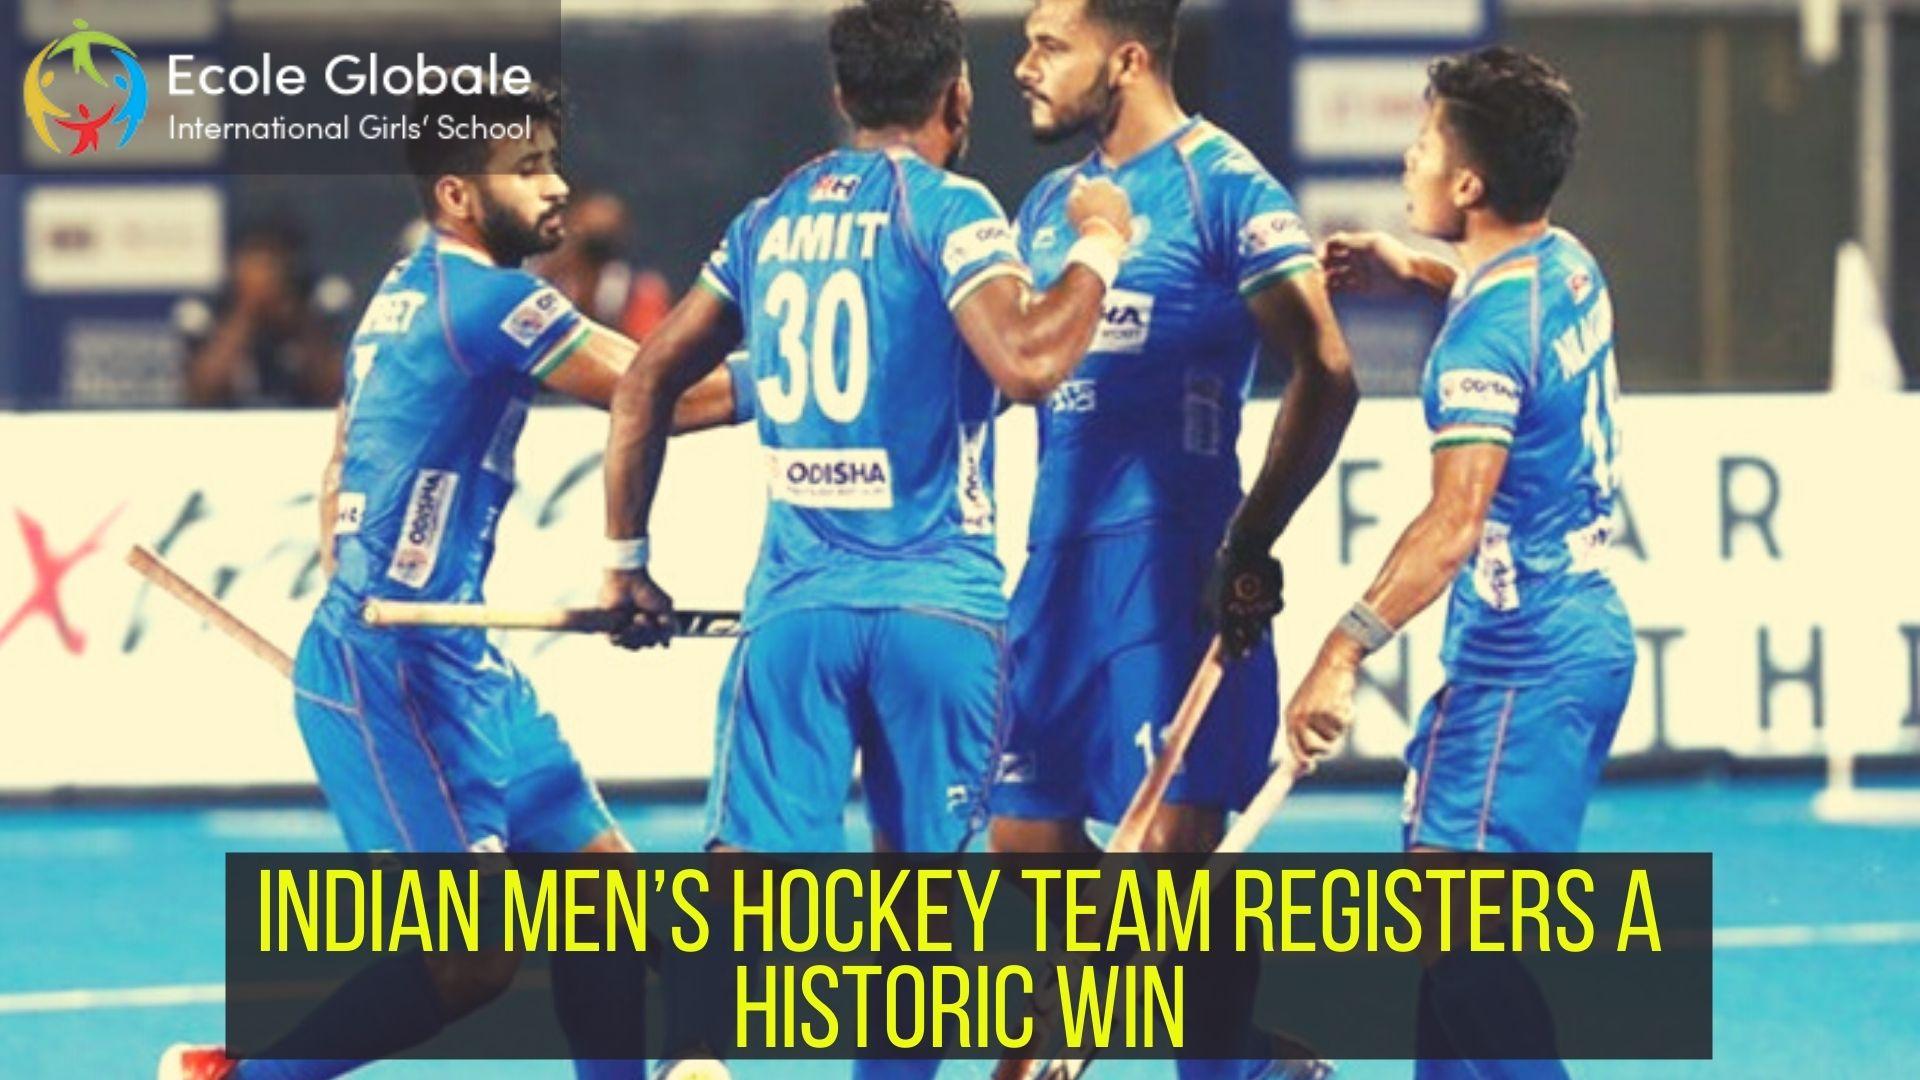 Tokyo Olympics: Indian Men's Hockey Team Registers a Historic Win